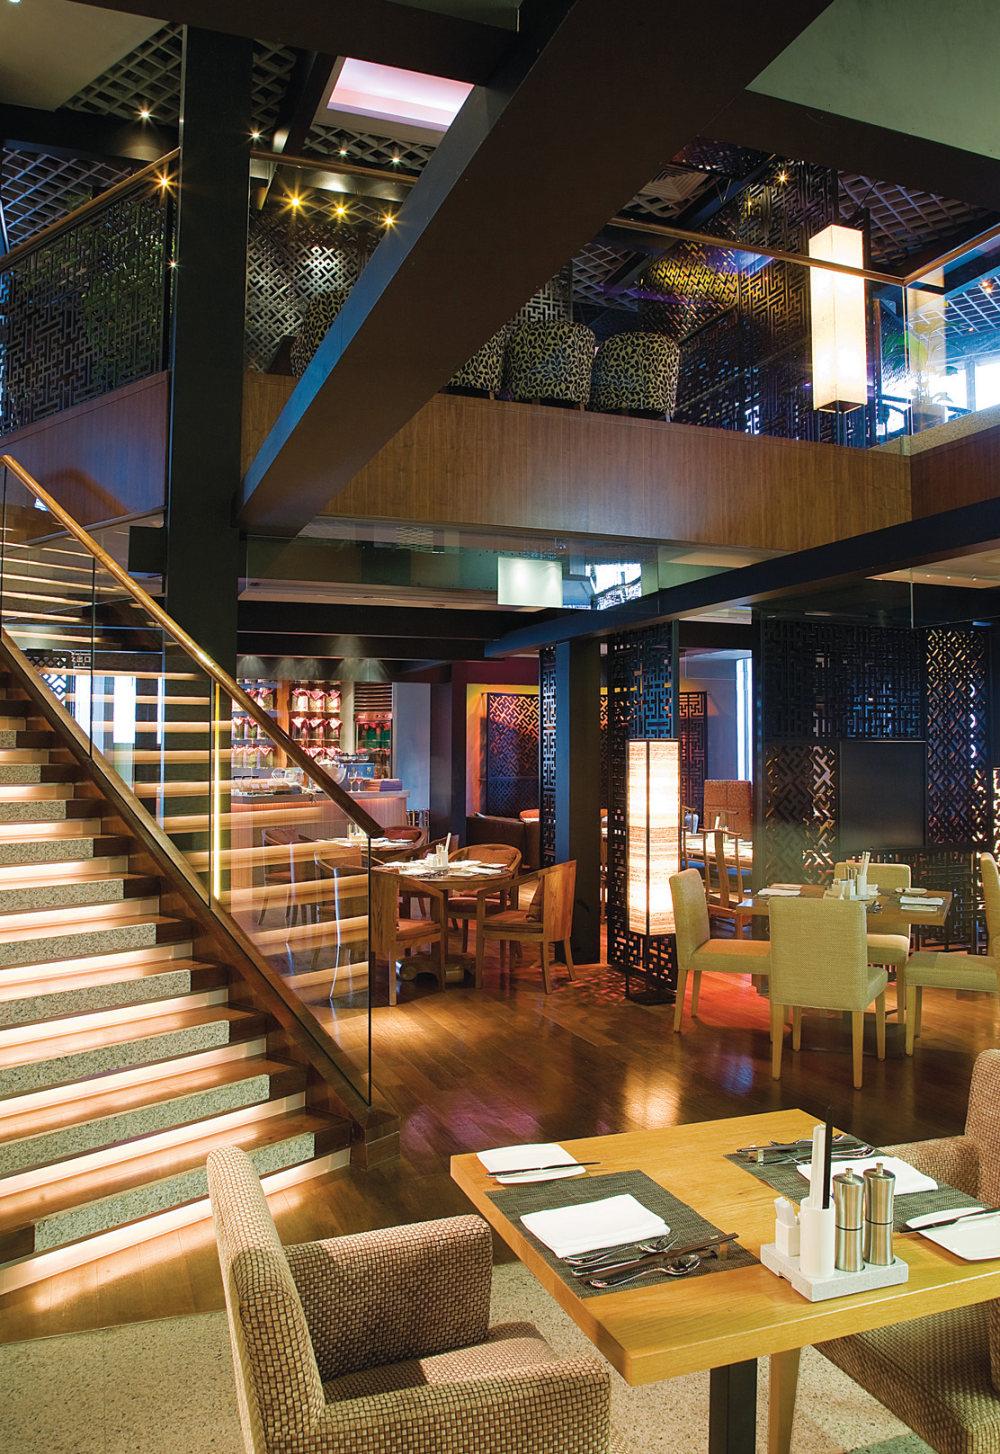 Top restaurant design 高级餐饮空间案例_卢丽丽-深圳福田香格里拉大酒店1.jpg